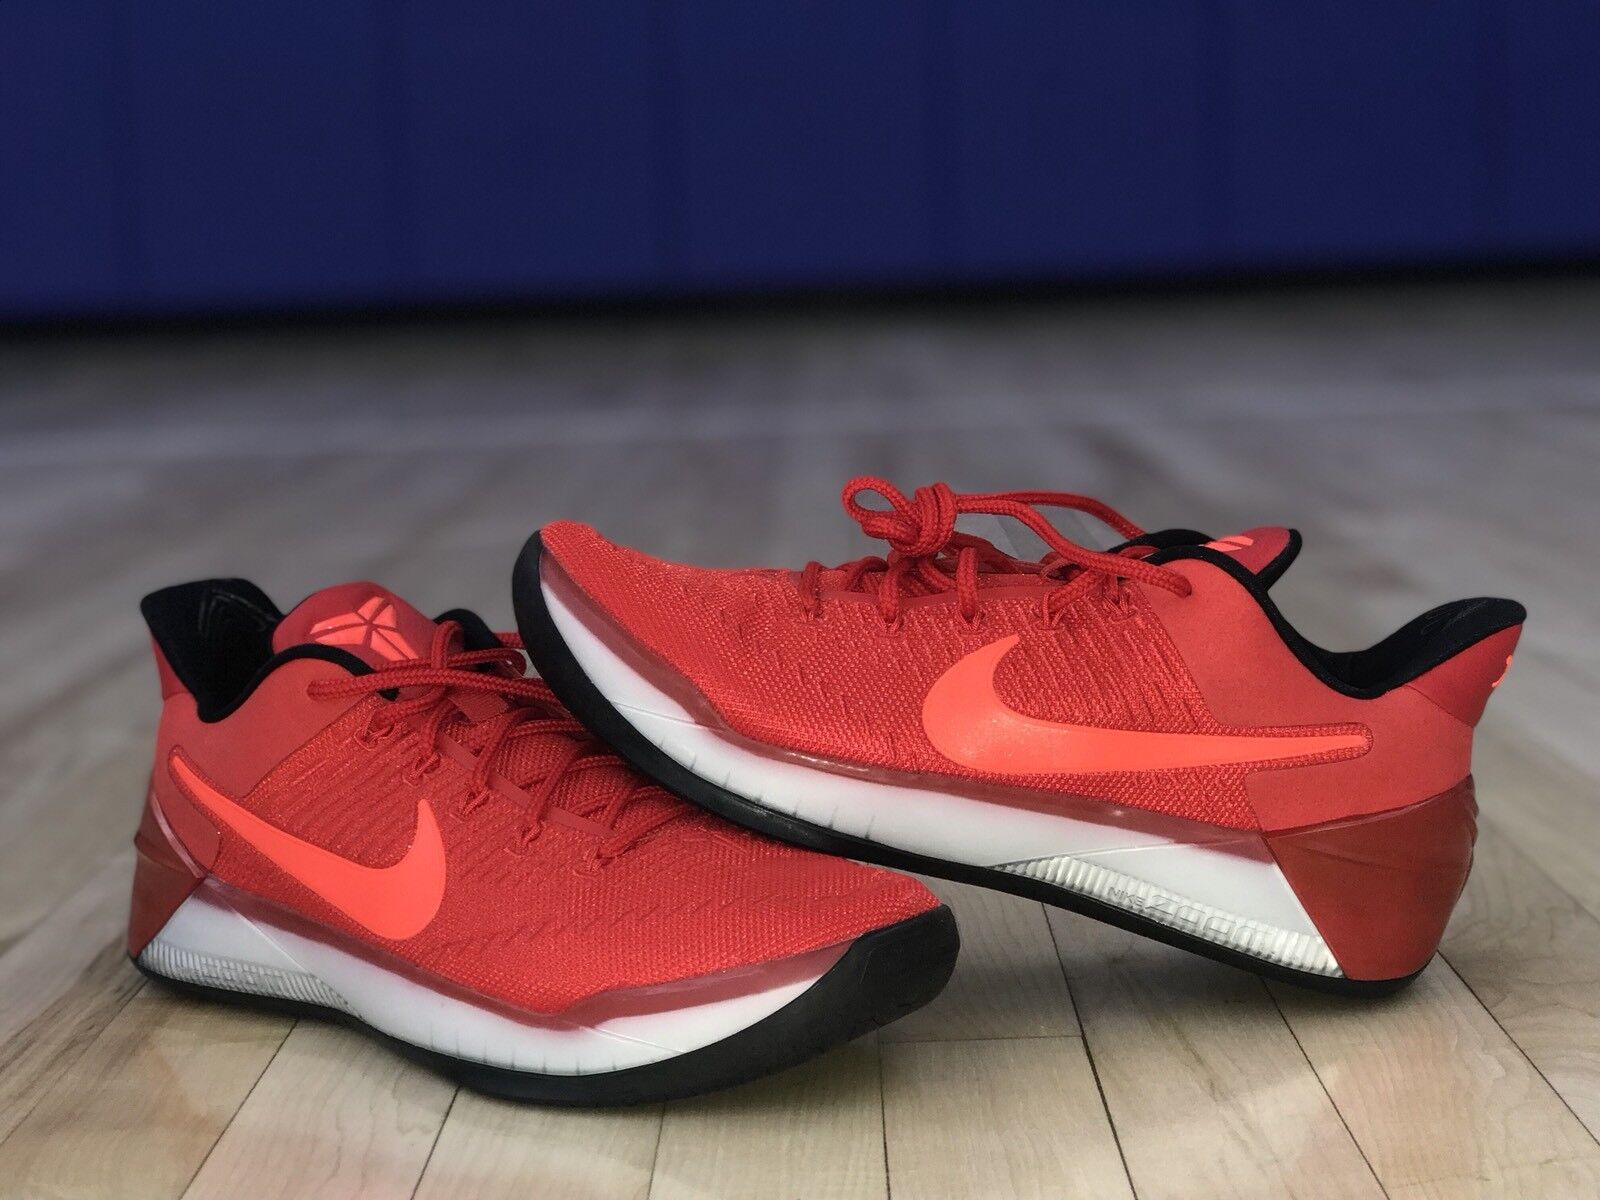 Nike kobe annuncio d pe pe pe derozan universit rosso - nero bianco 852425 608 numero 10 197cfb